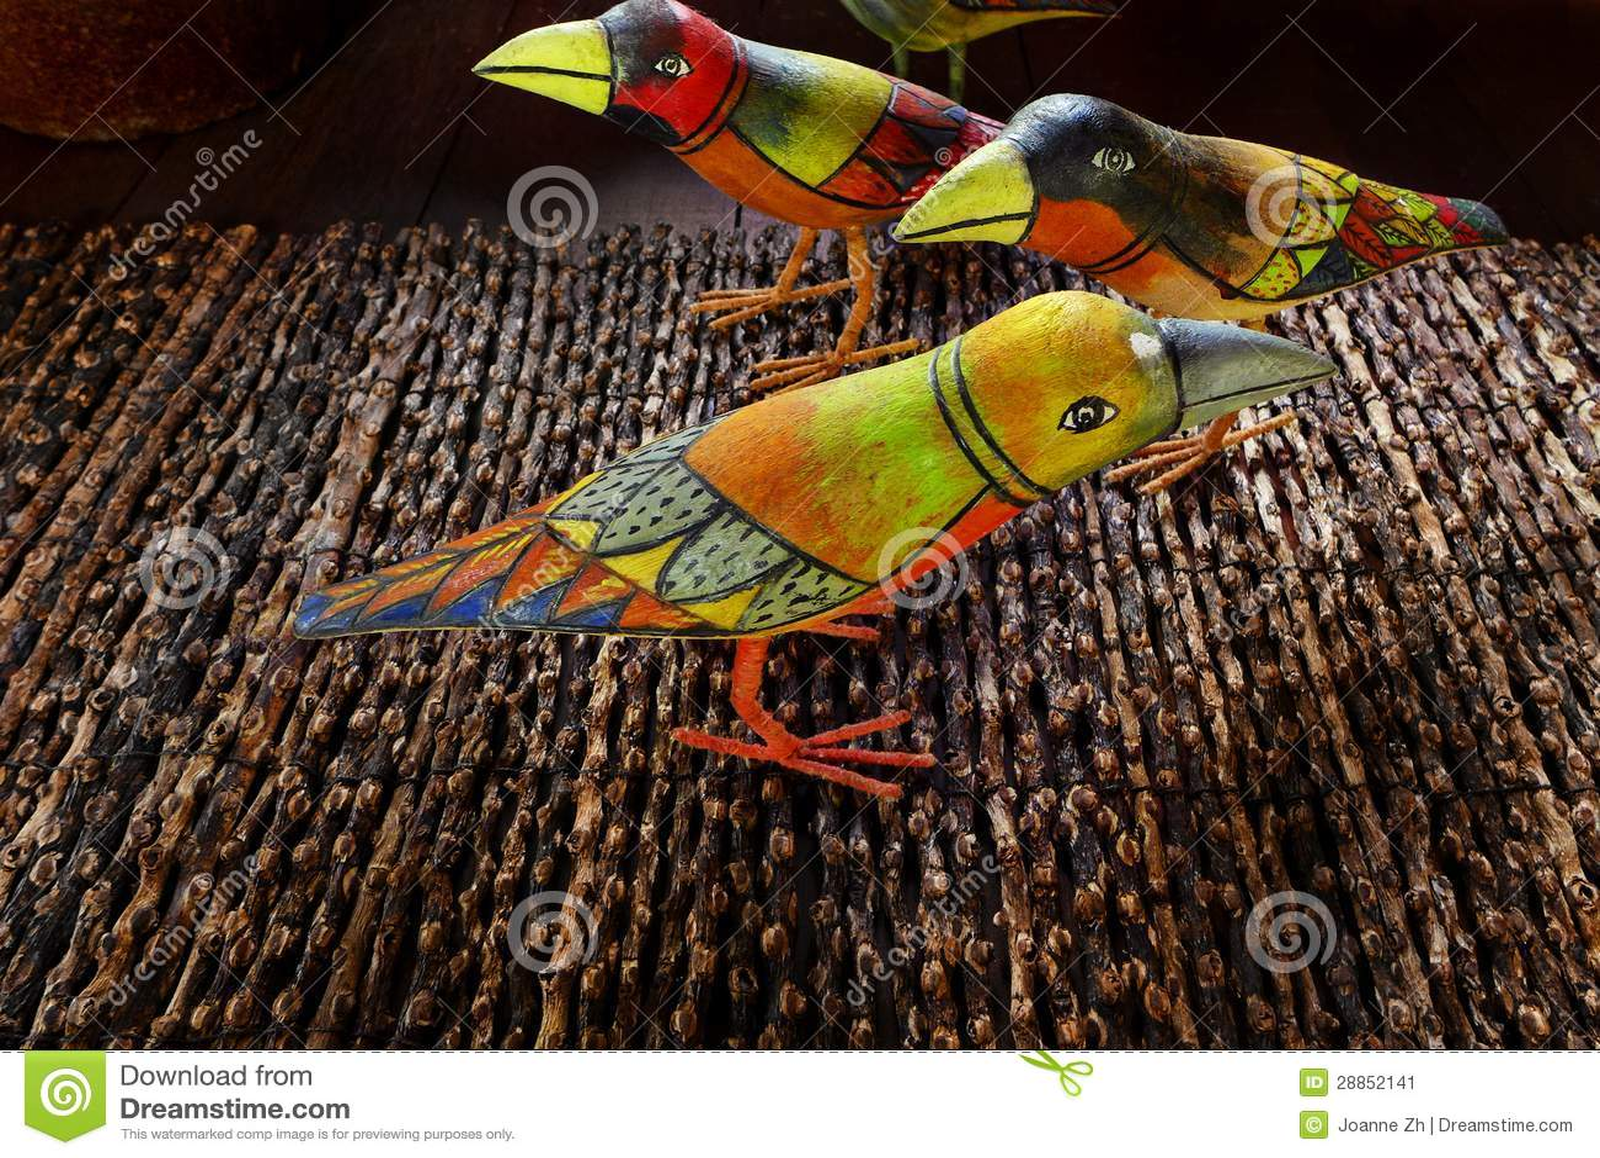 Indonesian Ethnic Art - Painted Wooden Birds Stock Image ...